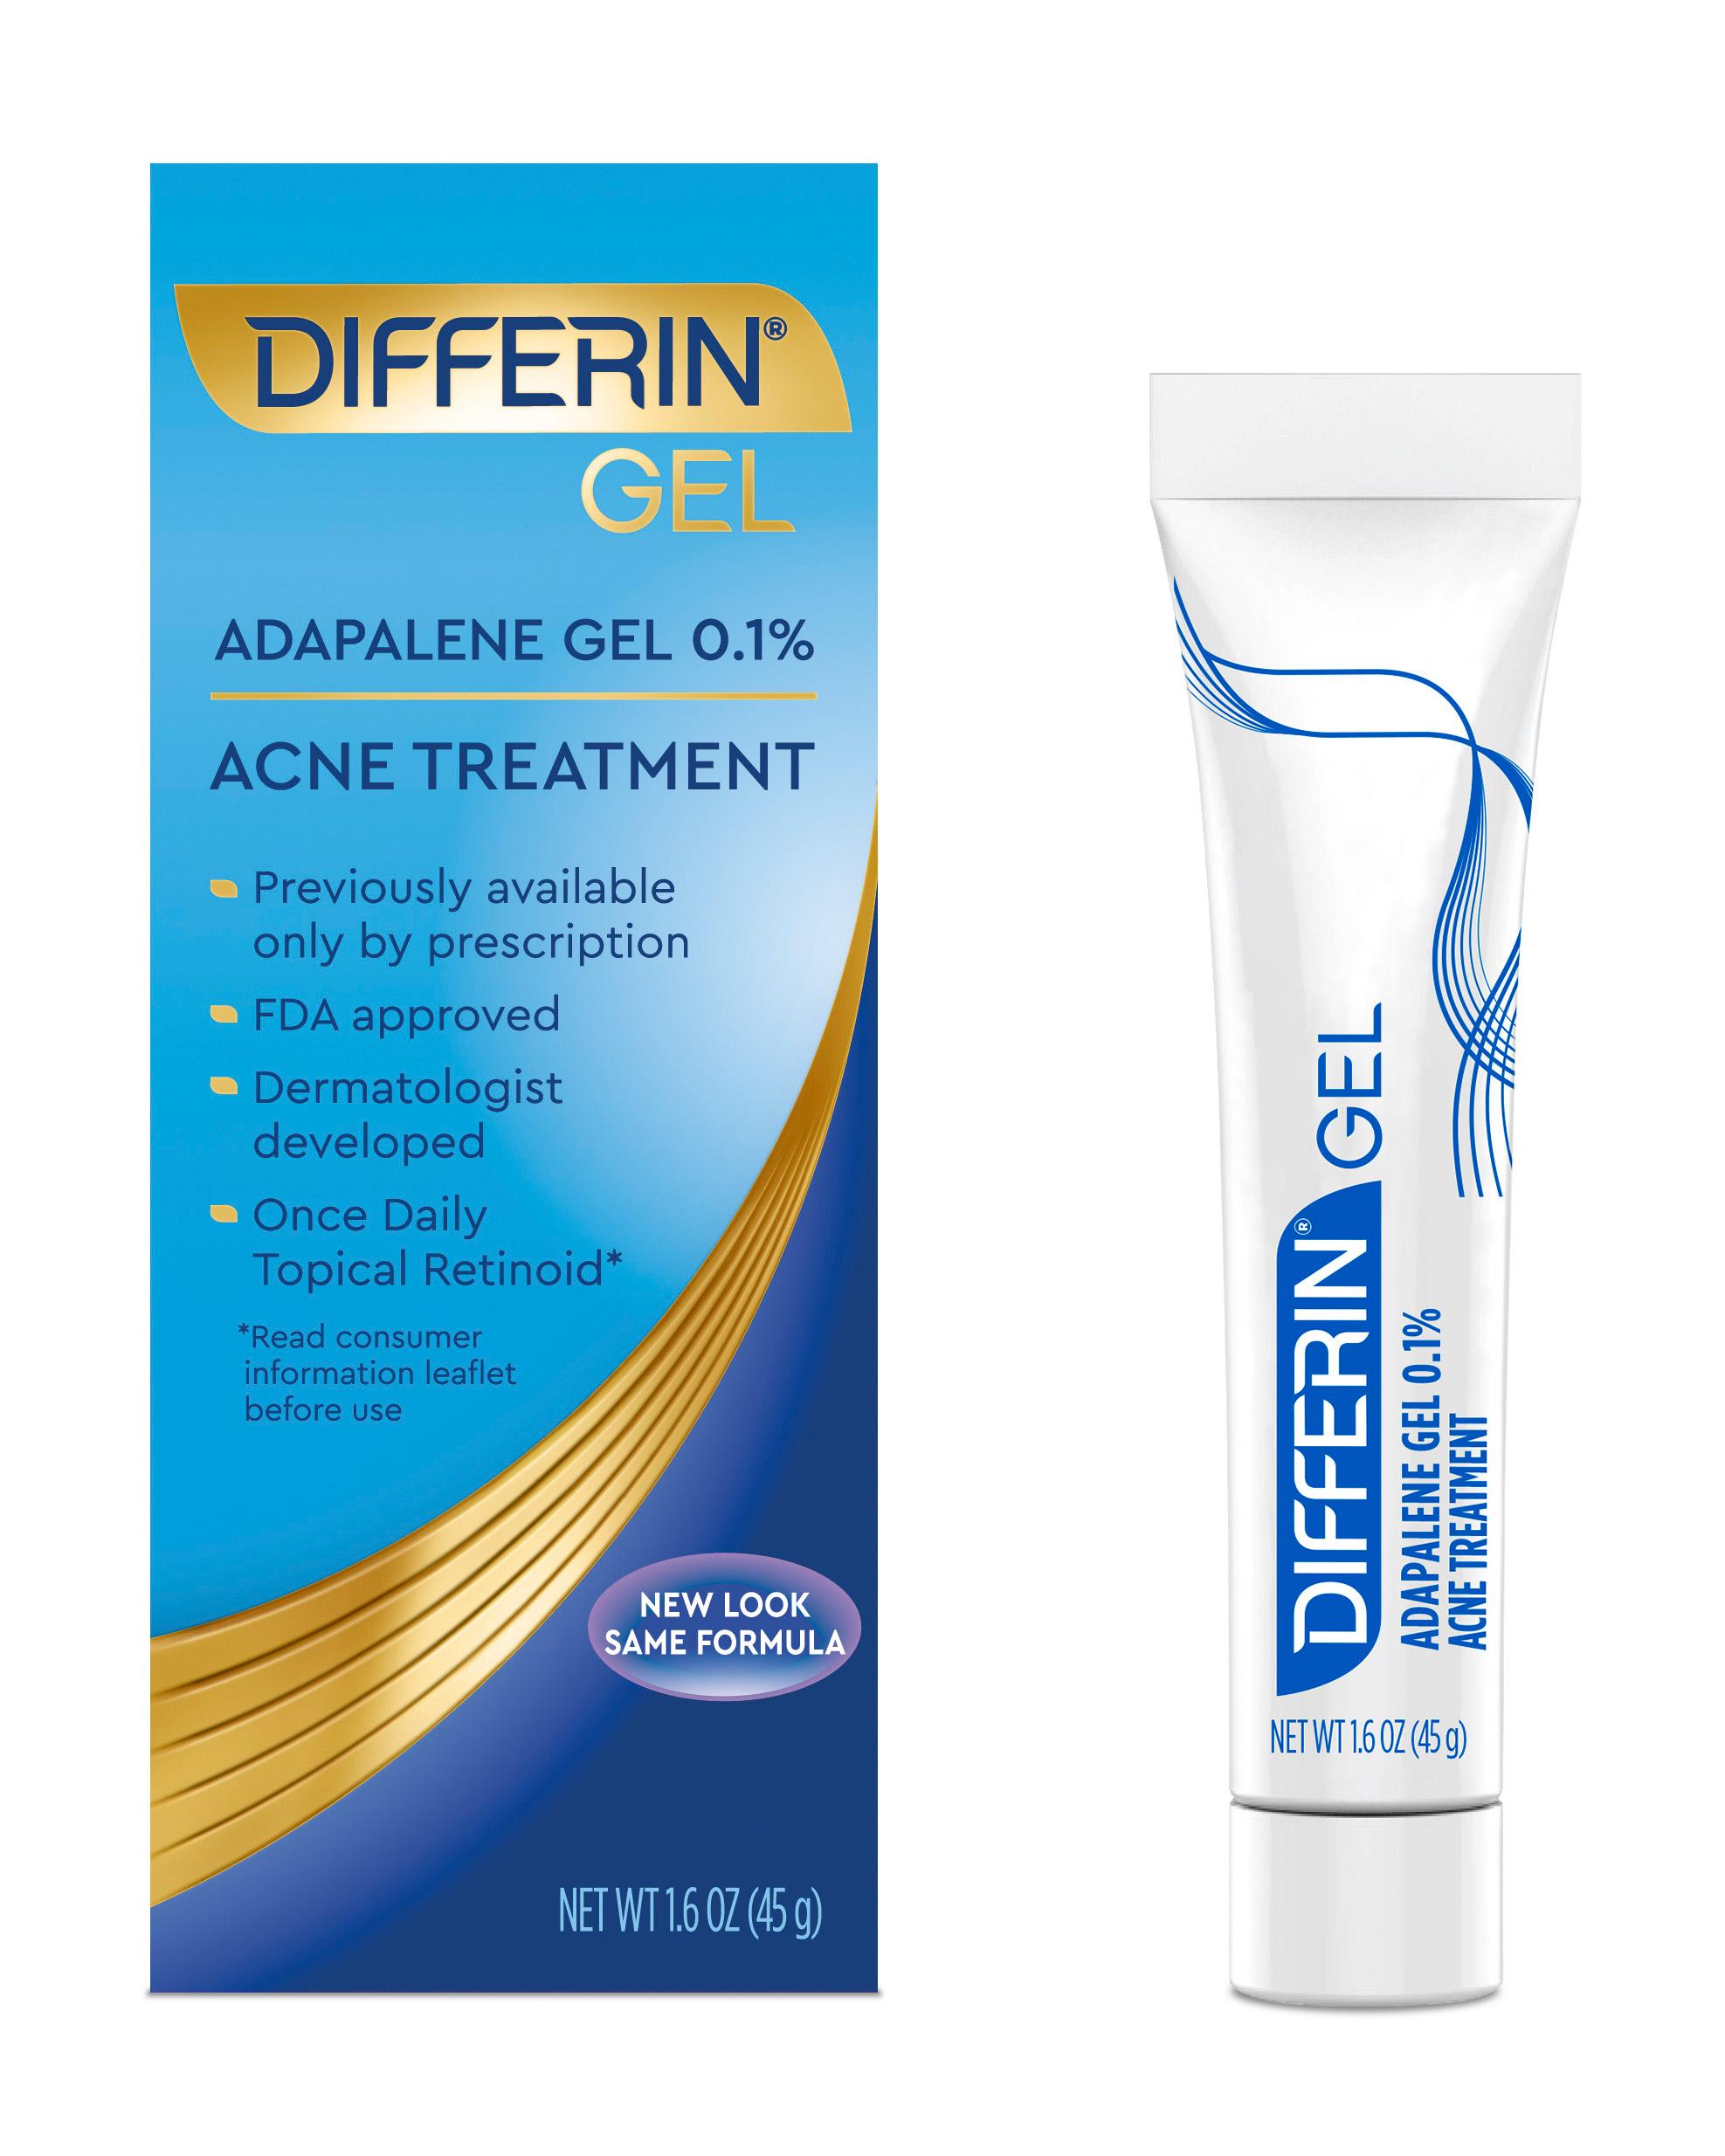 Differin Acne Treatment Gel